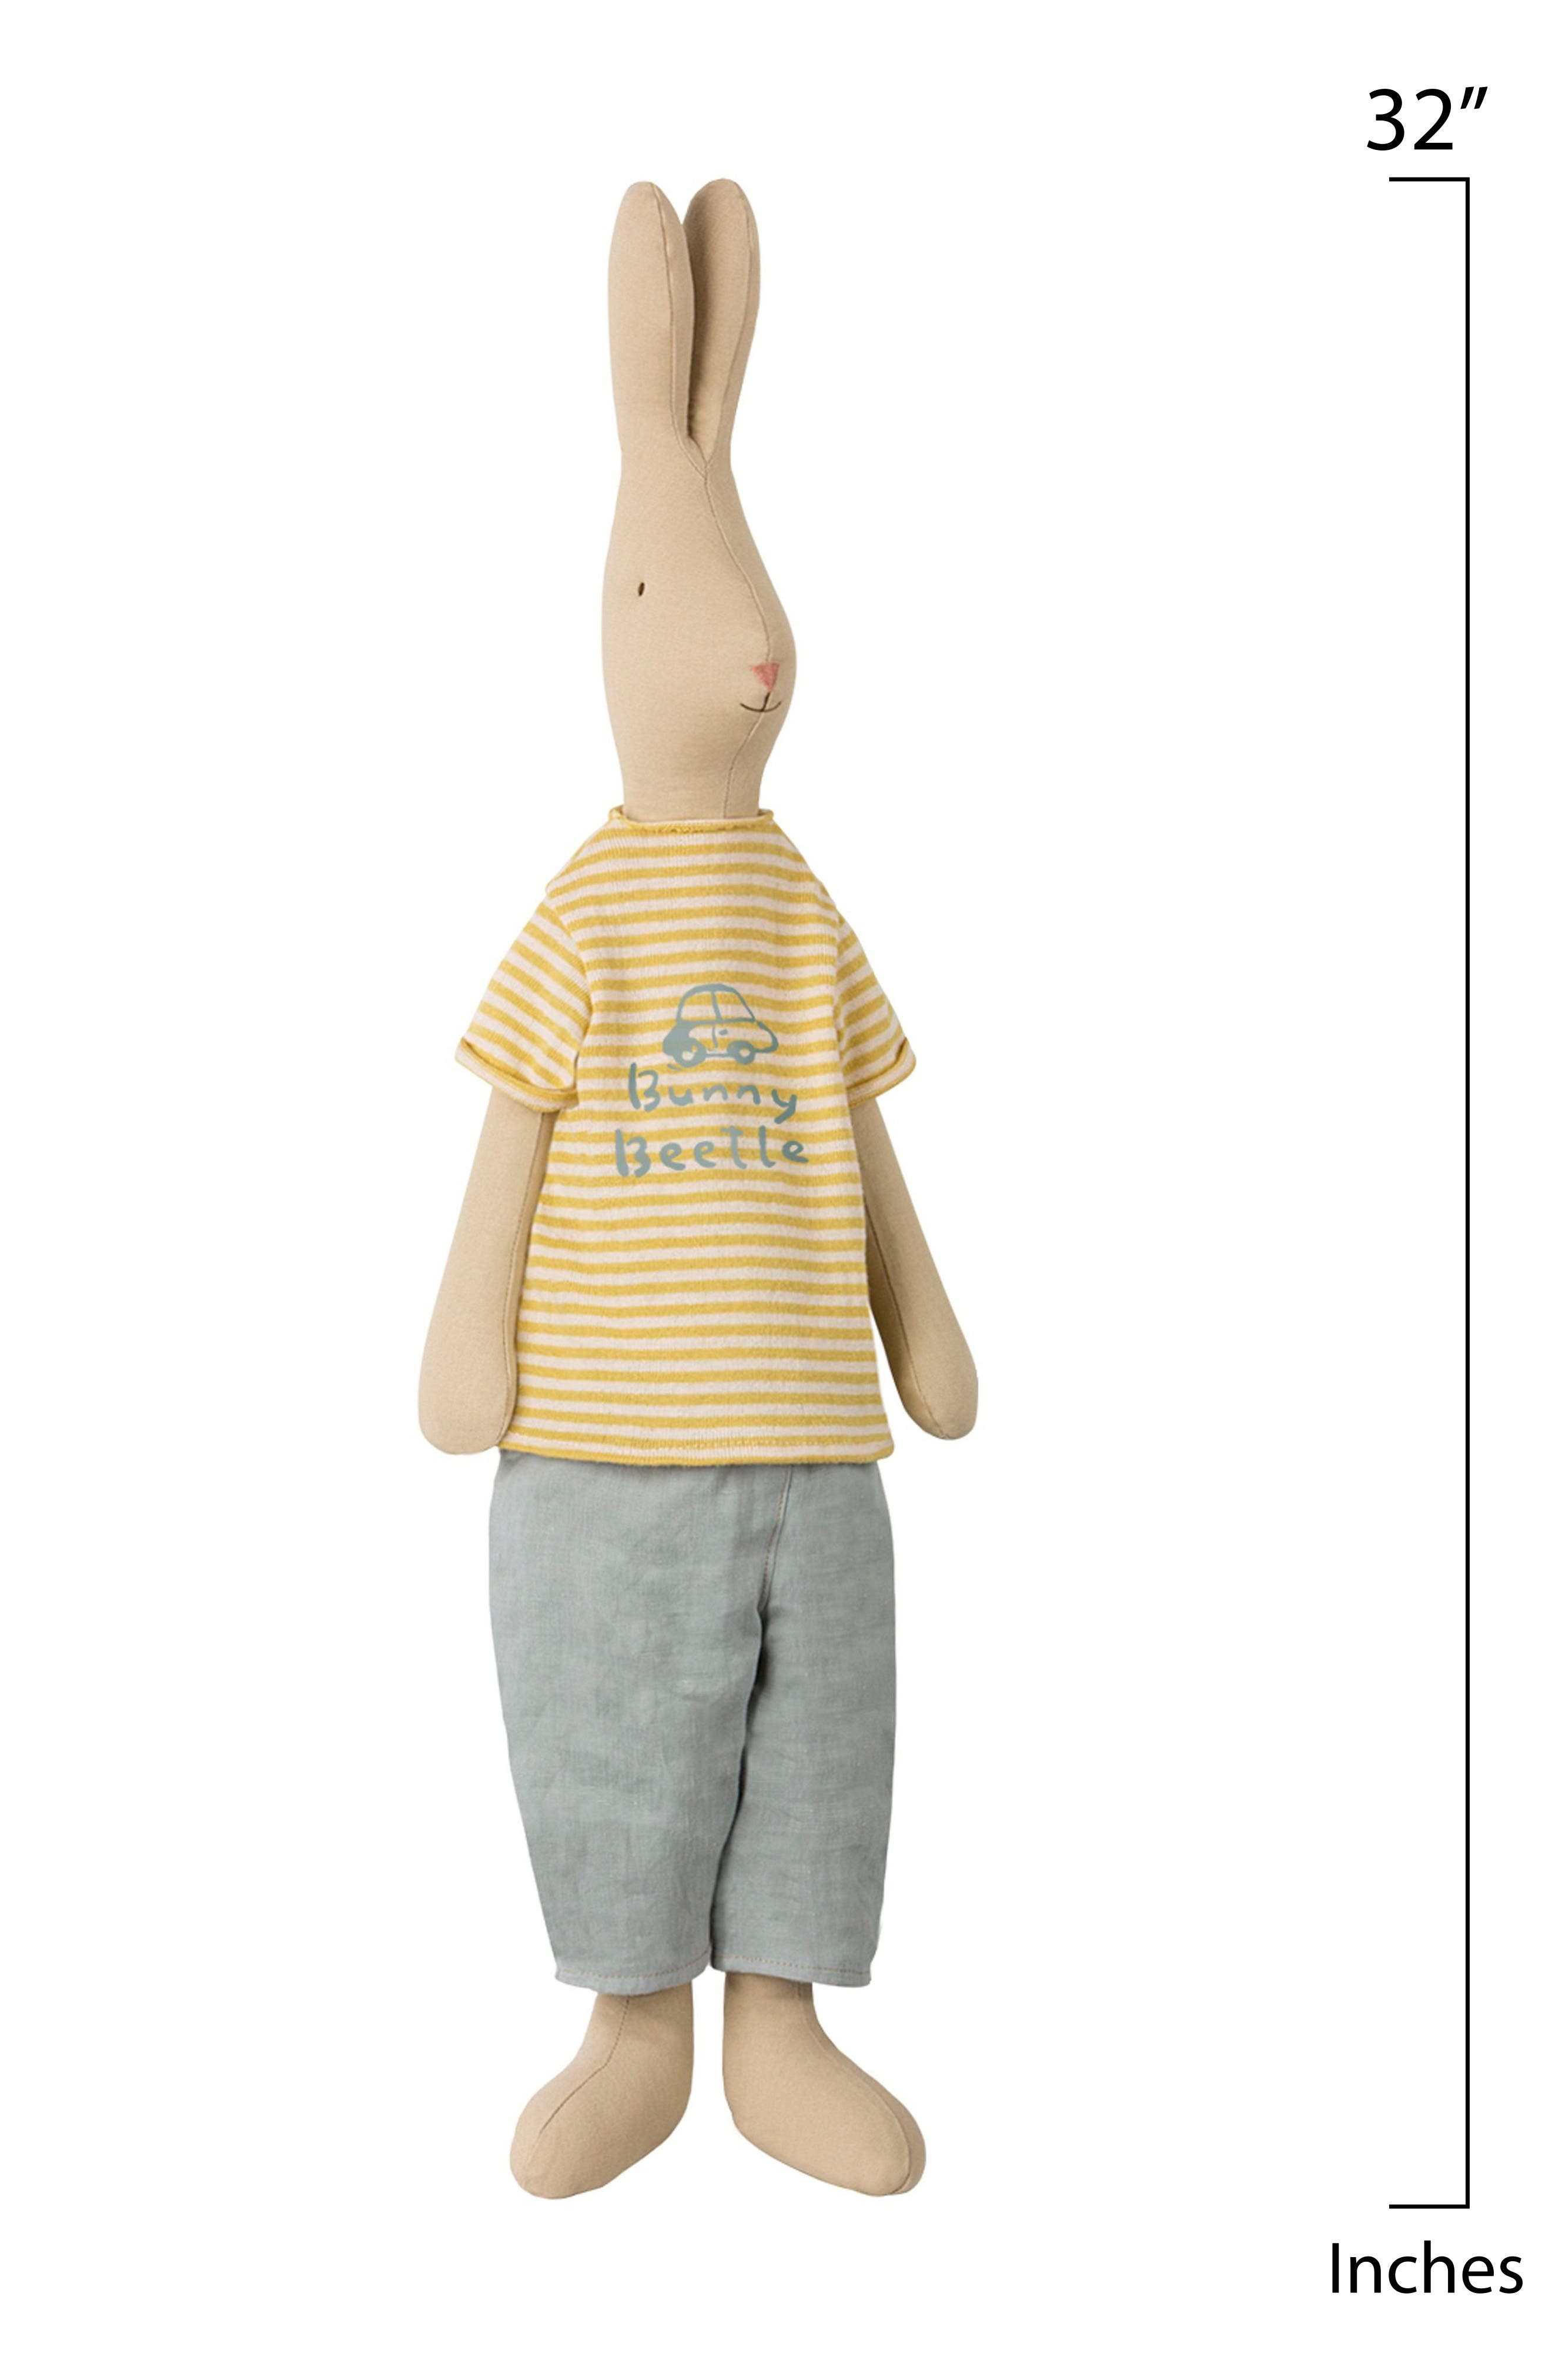 d2222ac5a2a2 Kids' Maileg Apparel: T-Shirts, Jeans, Pants & Hoodies | Nordstrom